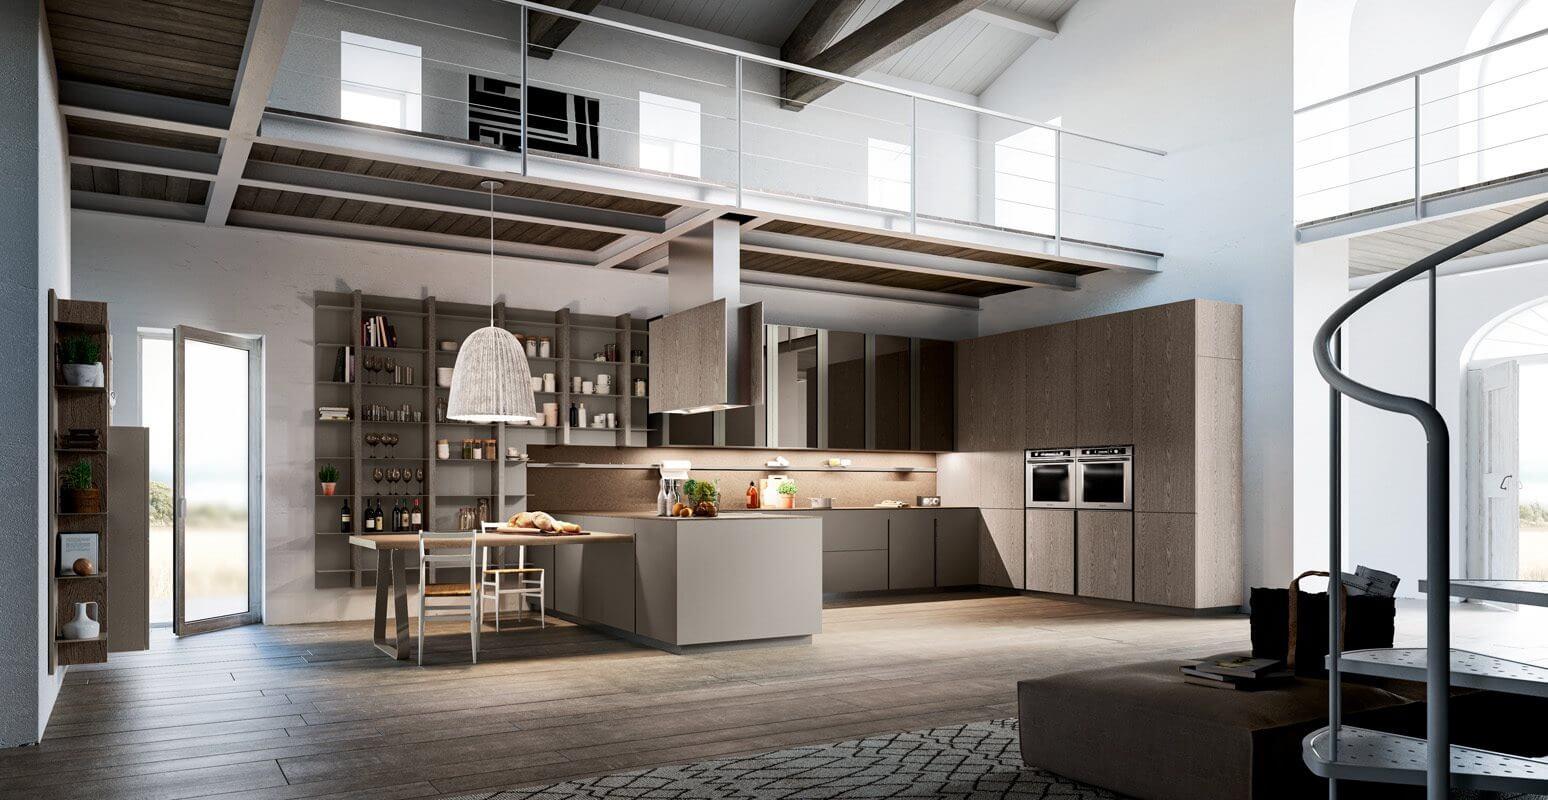 cucine-moderne-e di-design-composit